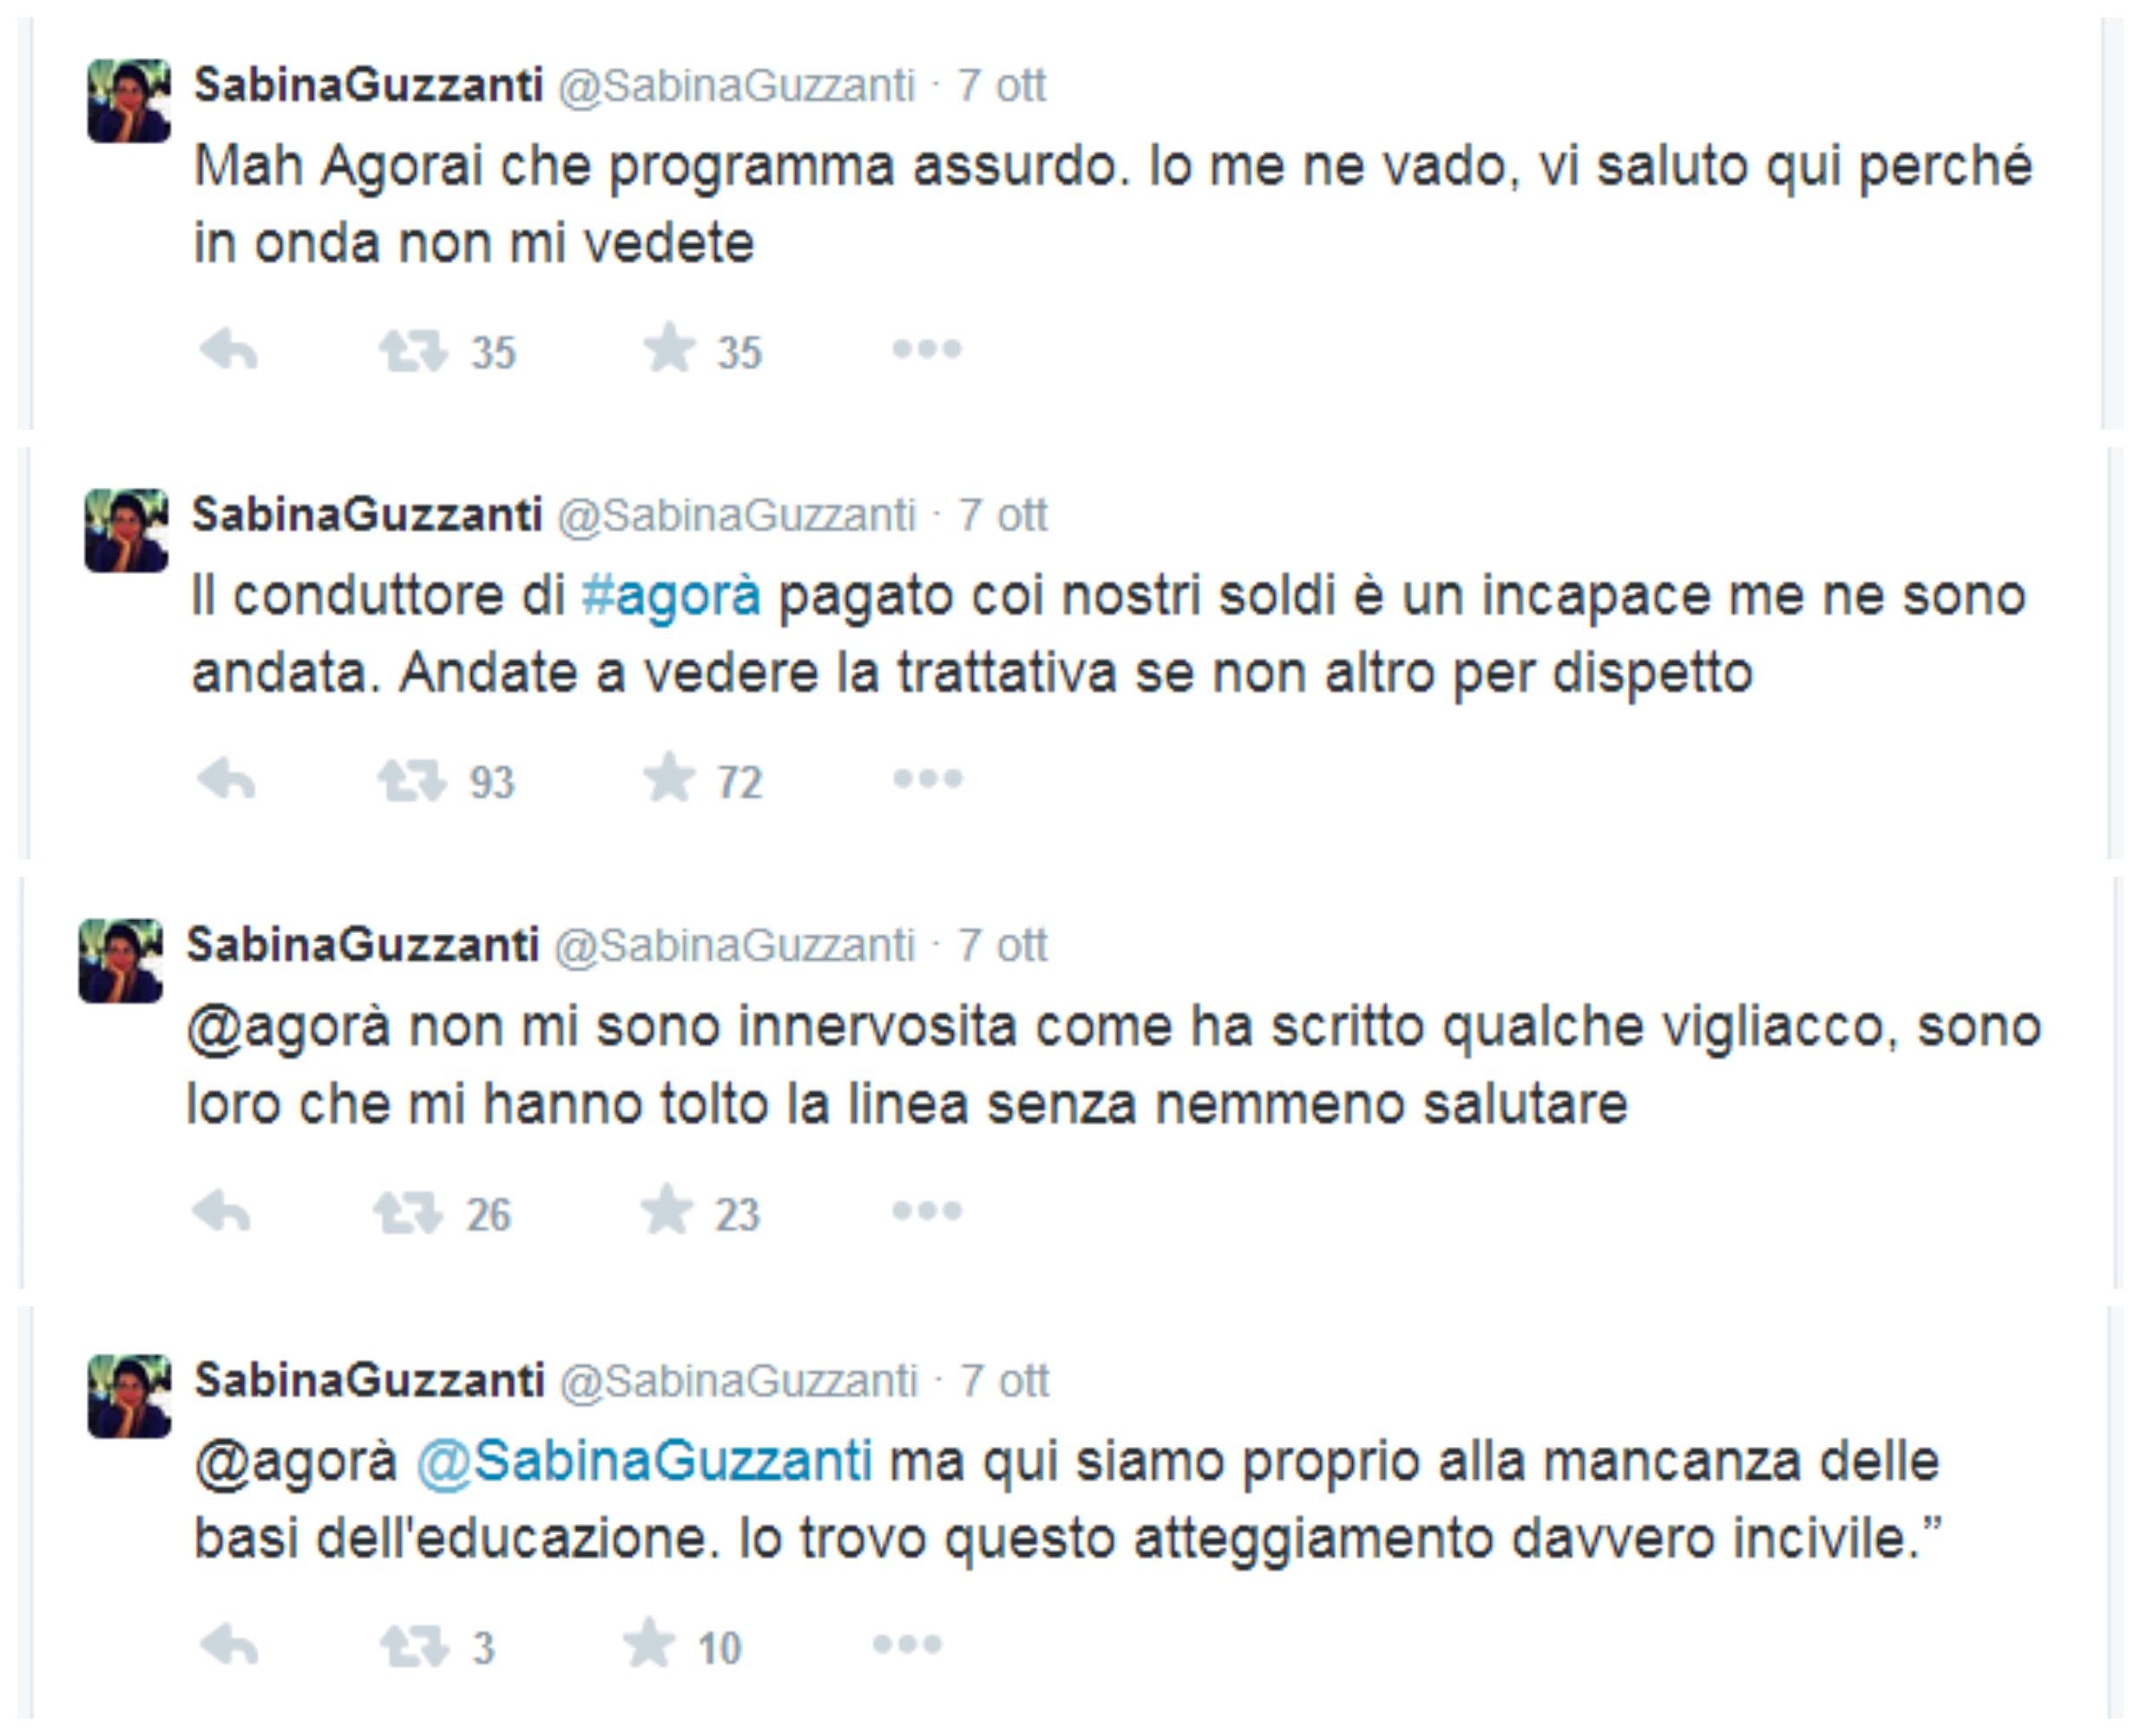 TWITTER FOLIES: SABINA GUZZANTI VS AGORA' E GERARDO GRECO FOLIES